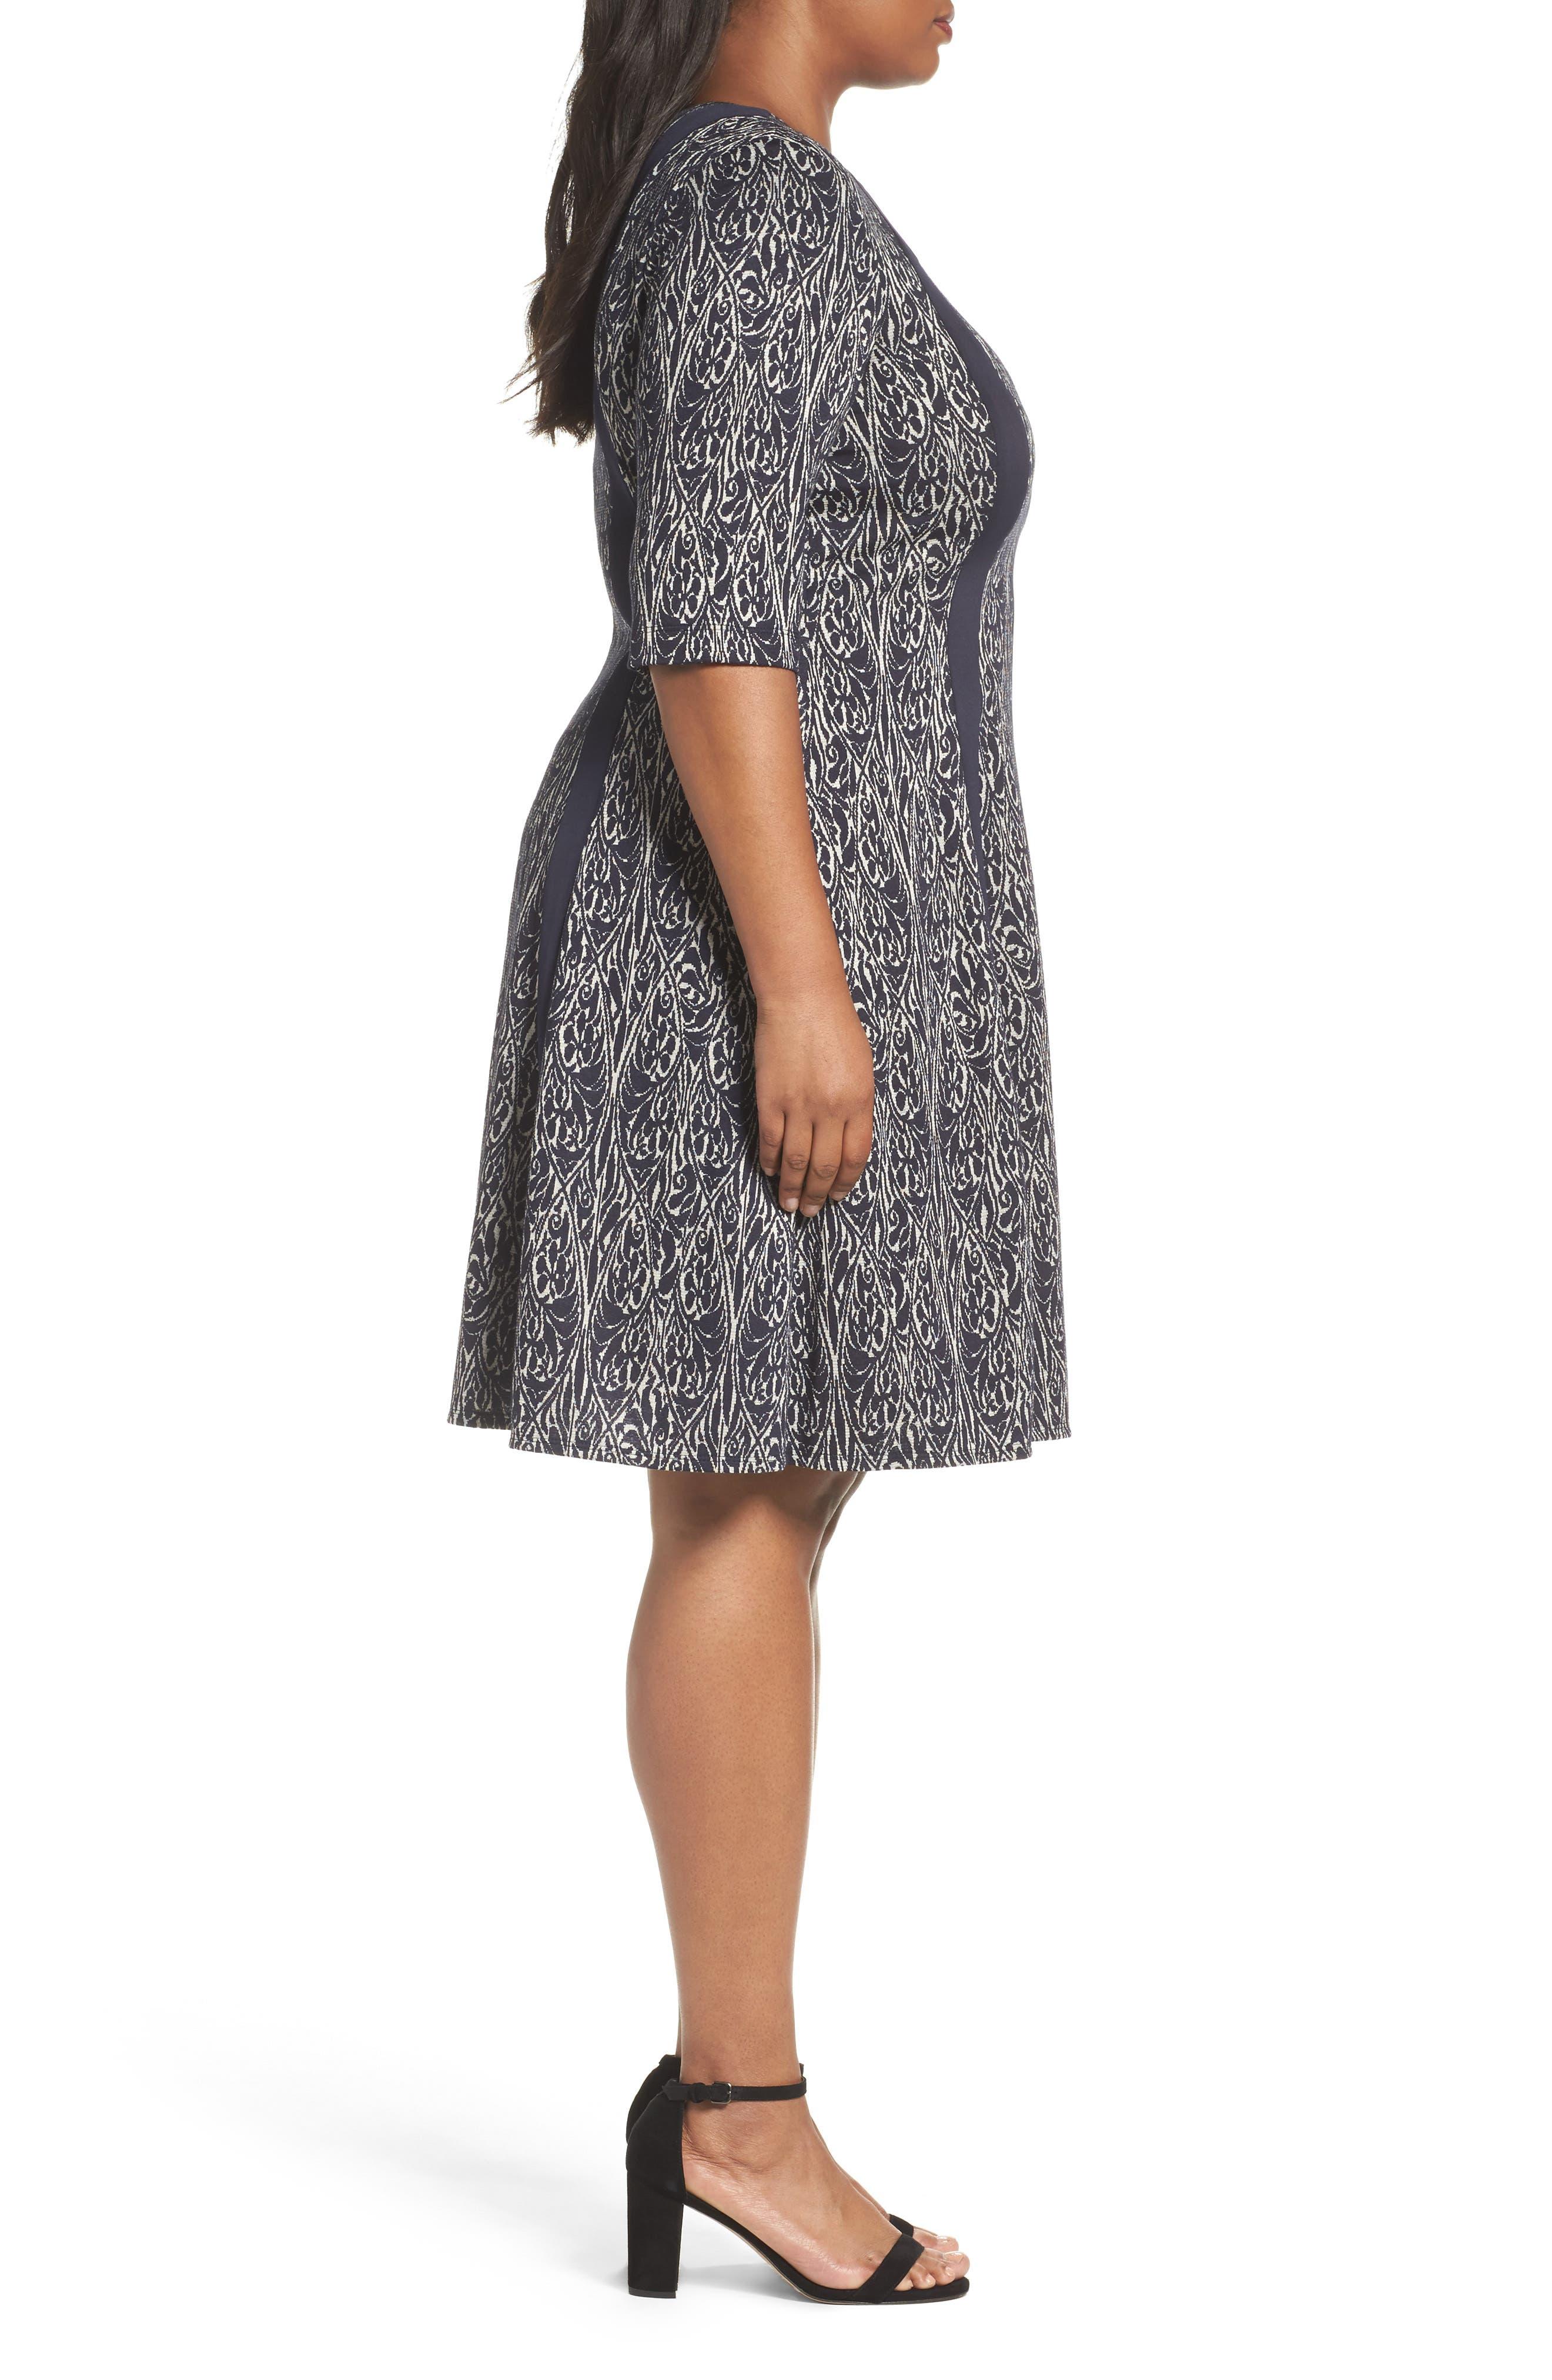 Jacquard Knit A-Line Dress,                             Alternate thumbnail 3, color,                             Navy/ Ivory